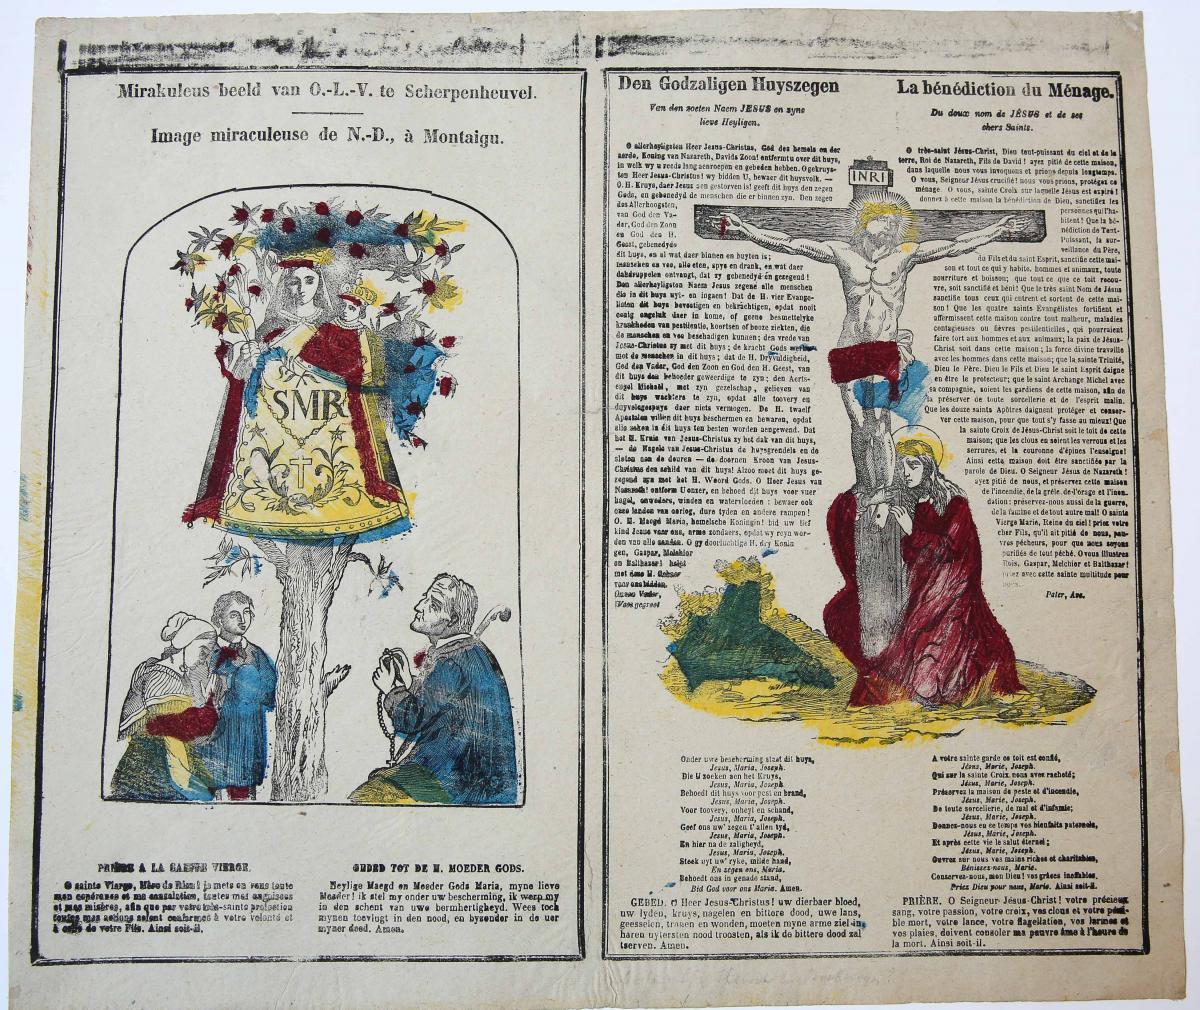 Centsprent: Mirakuleus beeld van O.-L.-V. te Scherpenheuvel / Image miraculeuse de N.-D., à Montaigu / Den Godzaligen Huyszegen / La bénédiction du Ménage.